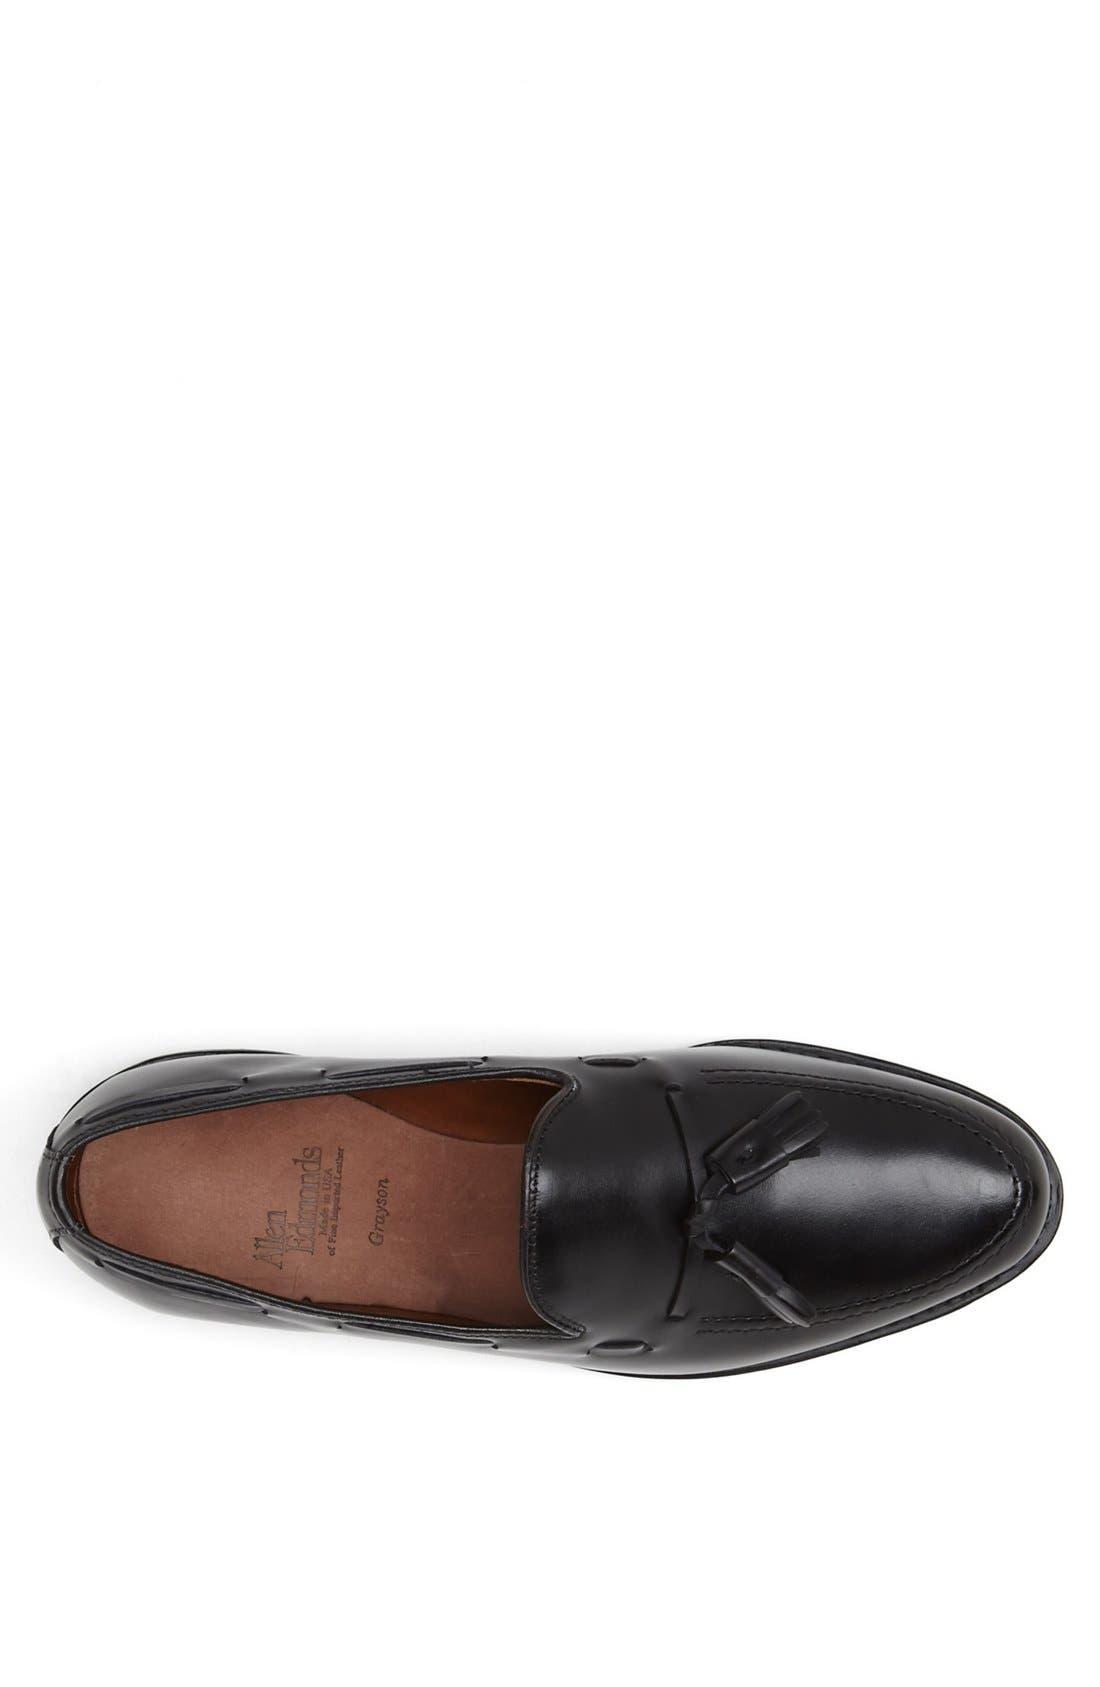 Alternate Image 3  - Allen Edmonds 'Grayson' Tassel Loafer (Men)